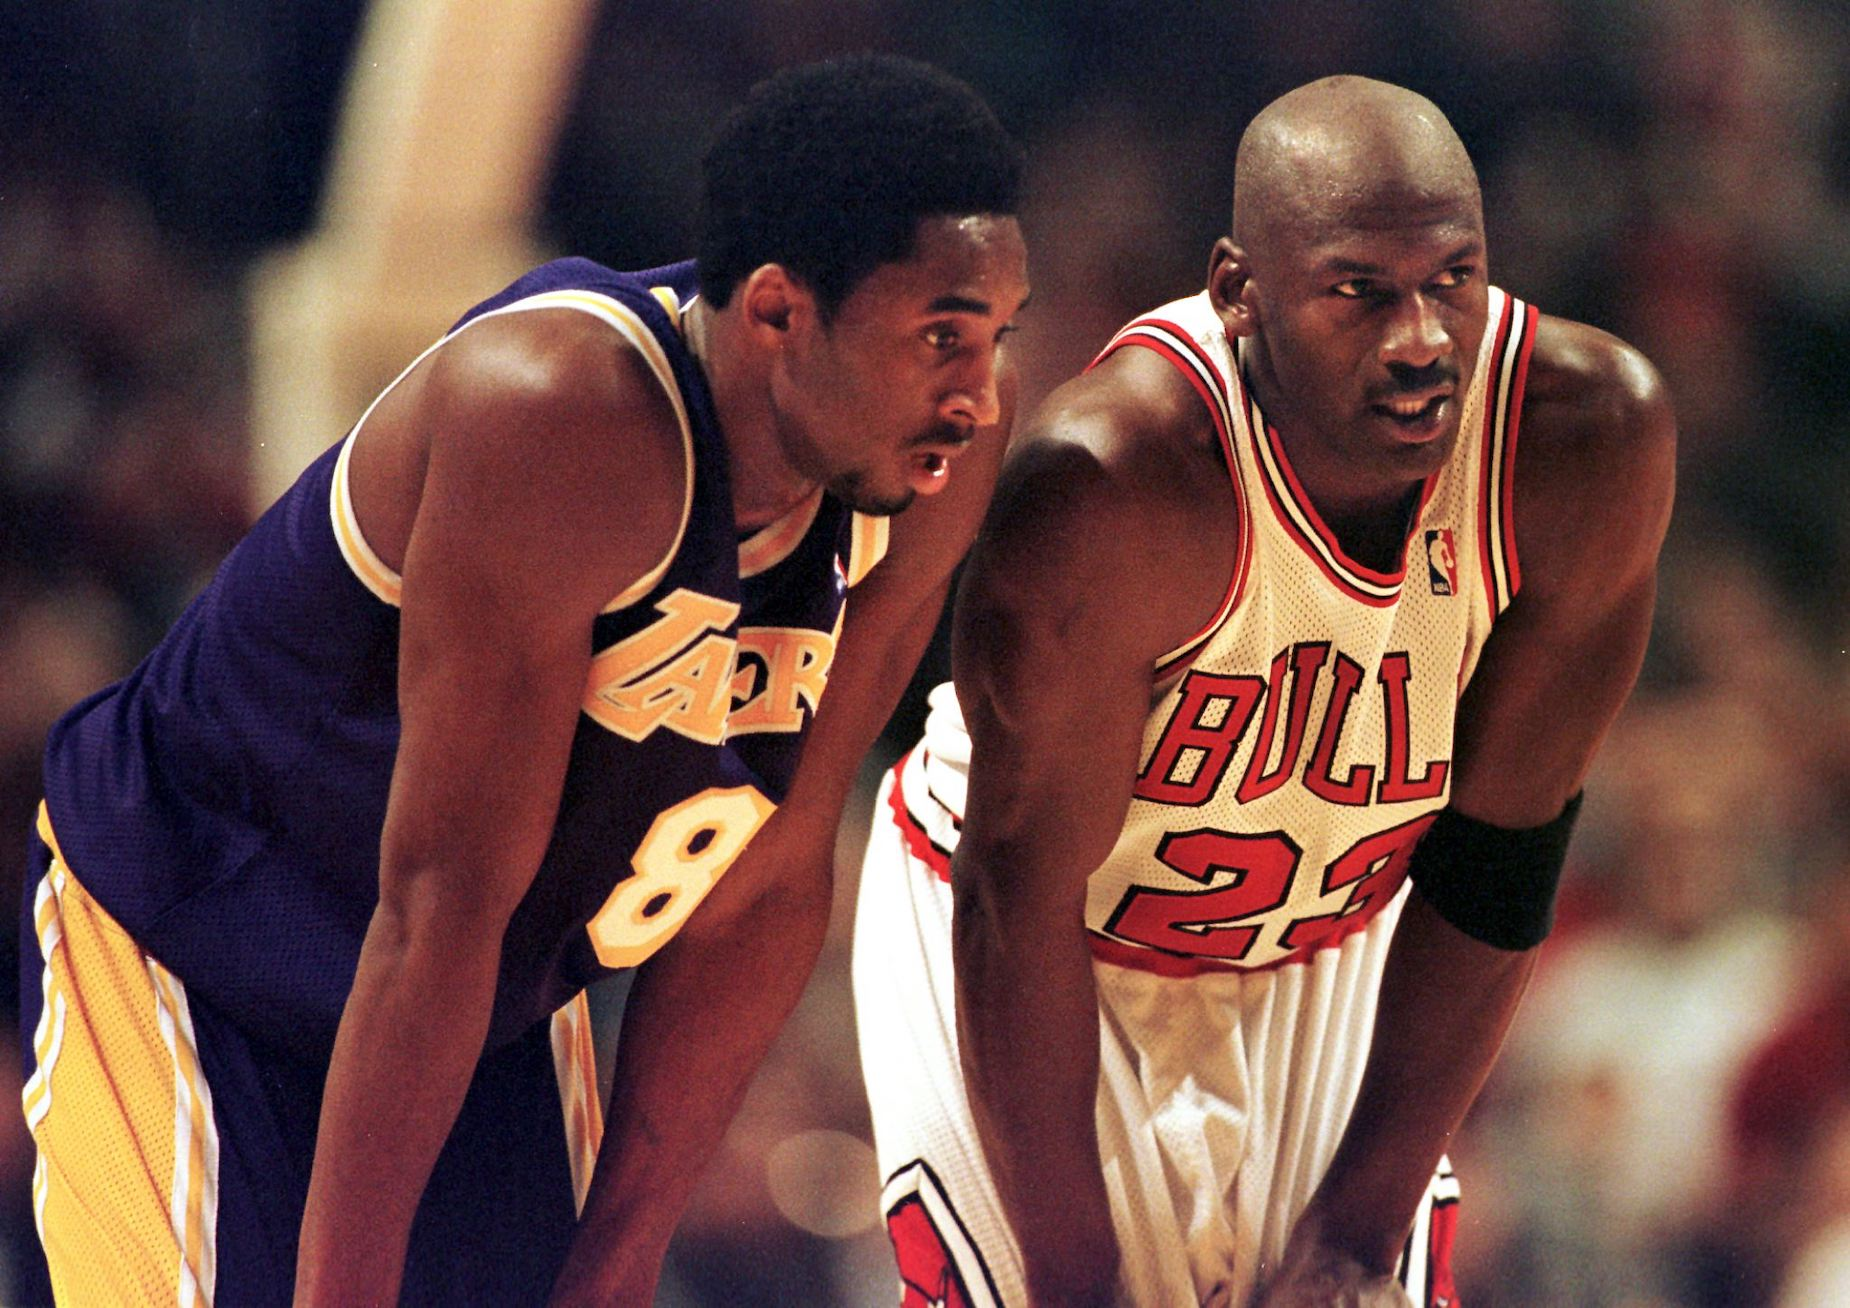 Kobe Bryant and Michael Jordan talk during a 1997 NBA game